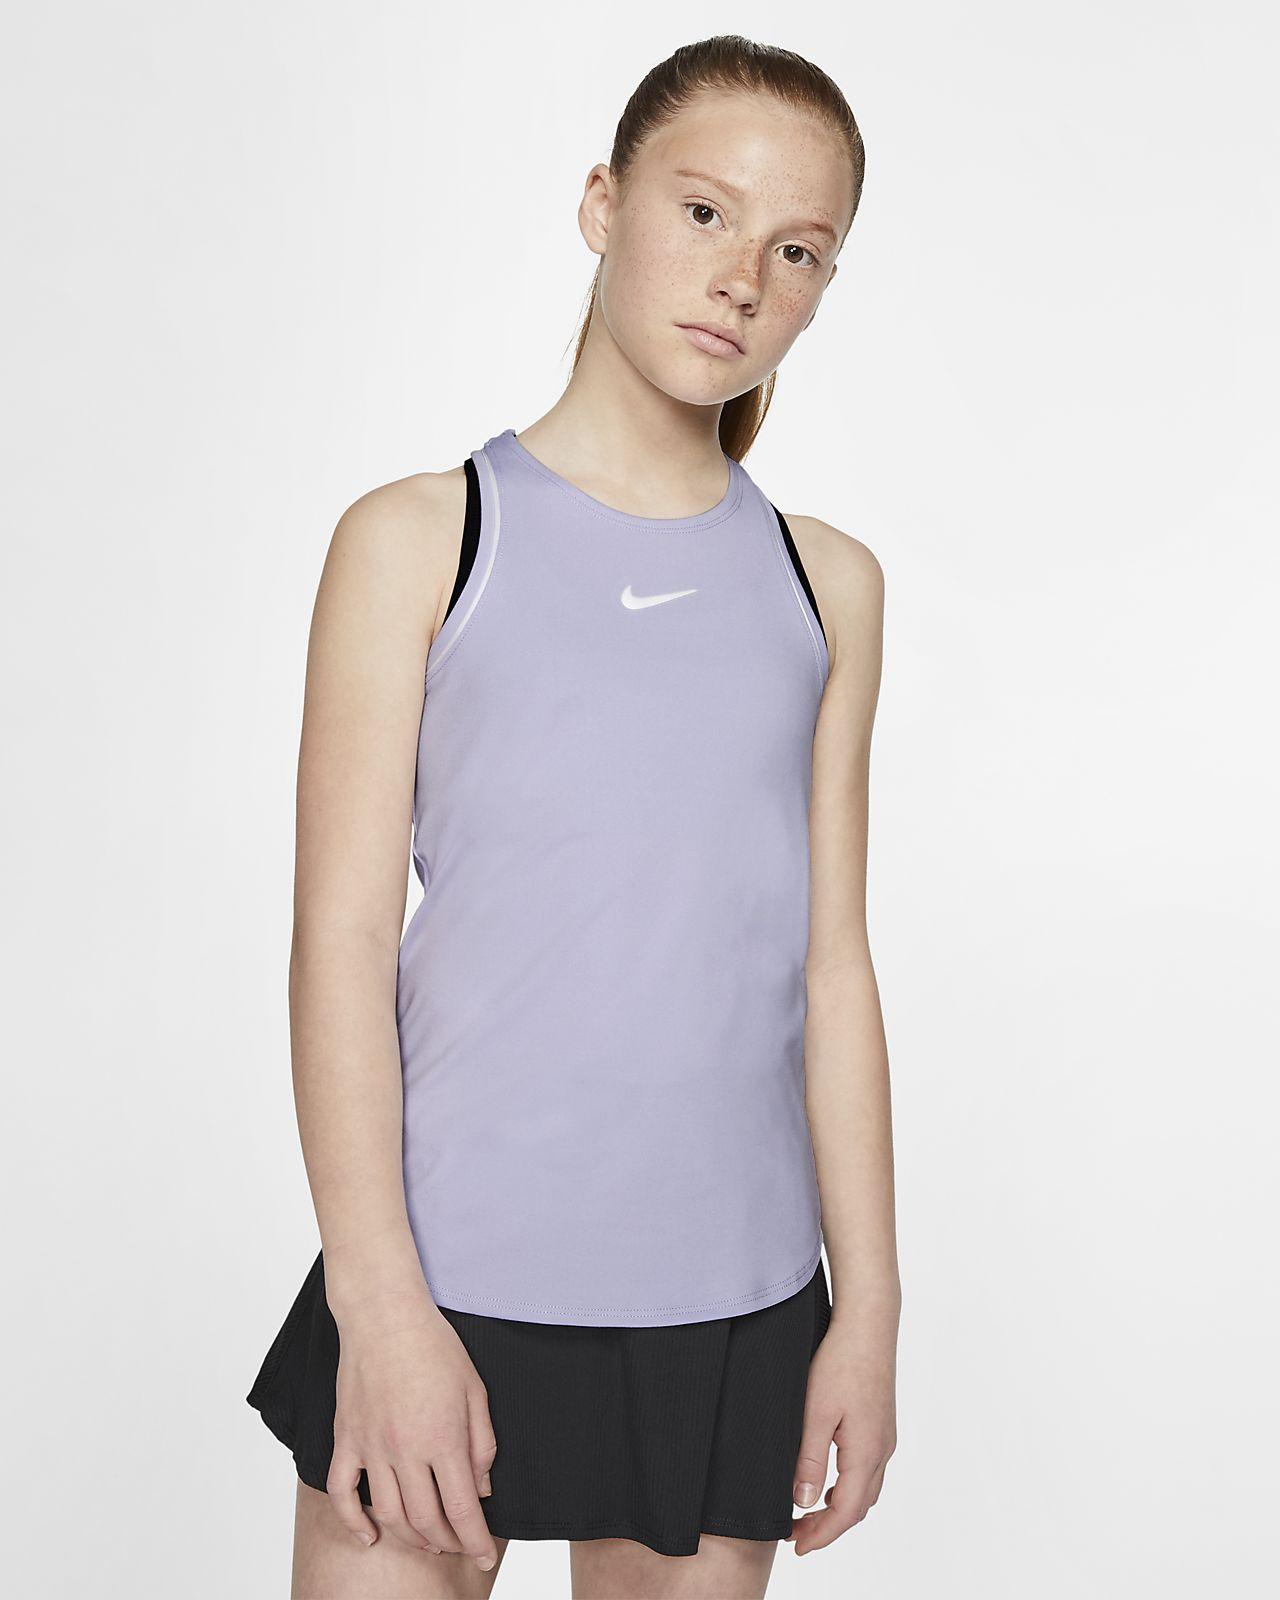 Camisola de ténis sem mangas NikeCourt Dri-FIT Júnior (Rapariga)